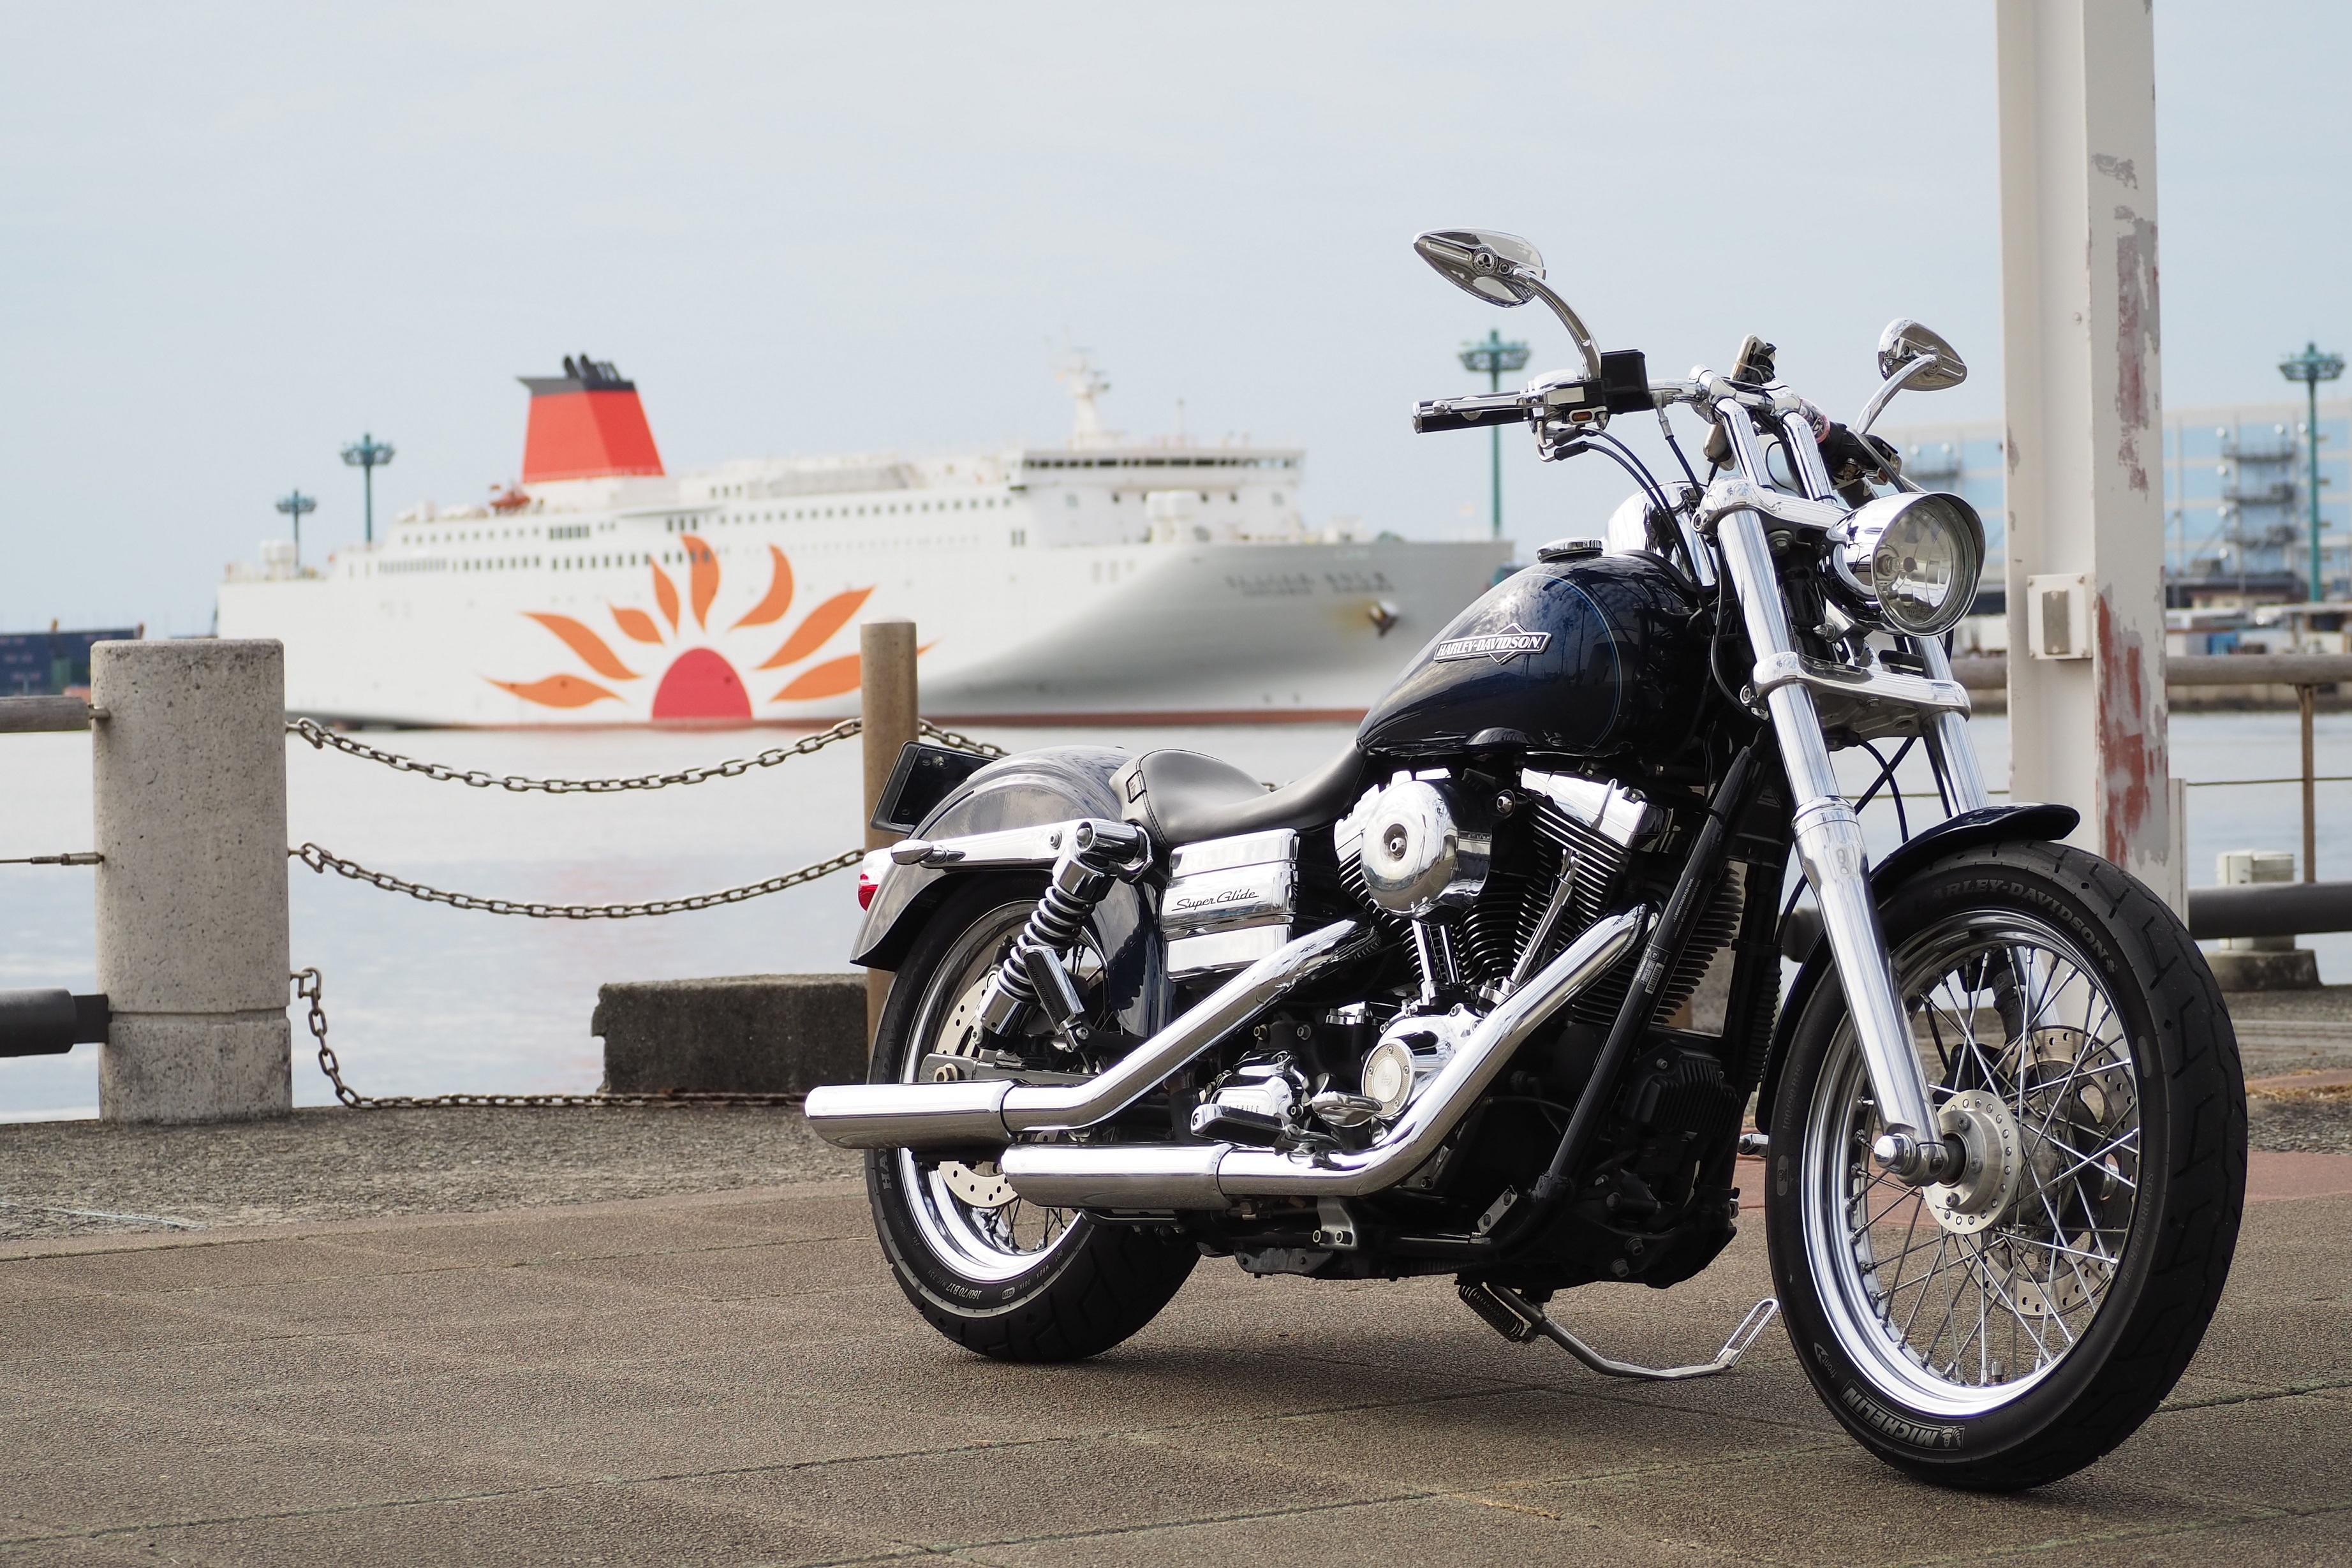 harleydavidson-motorcycle-touring-blog-osaka-port-atc-ferry-kyushu.jpg